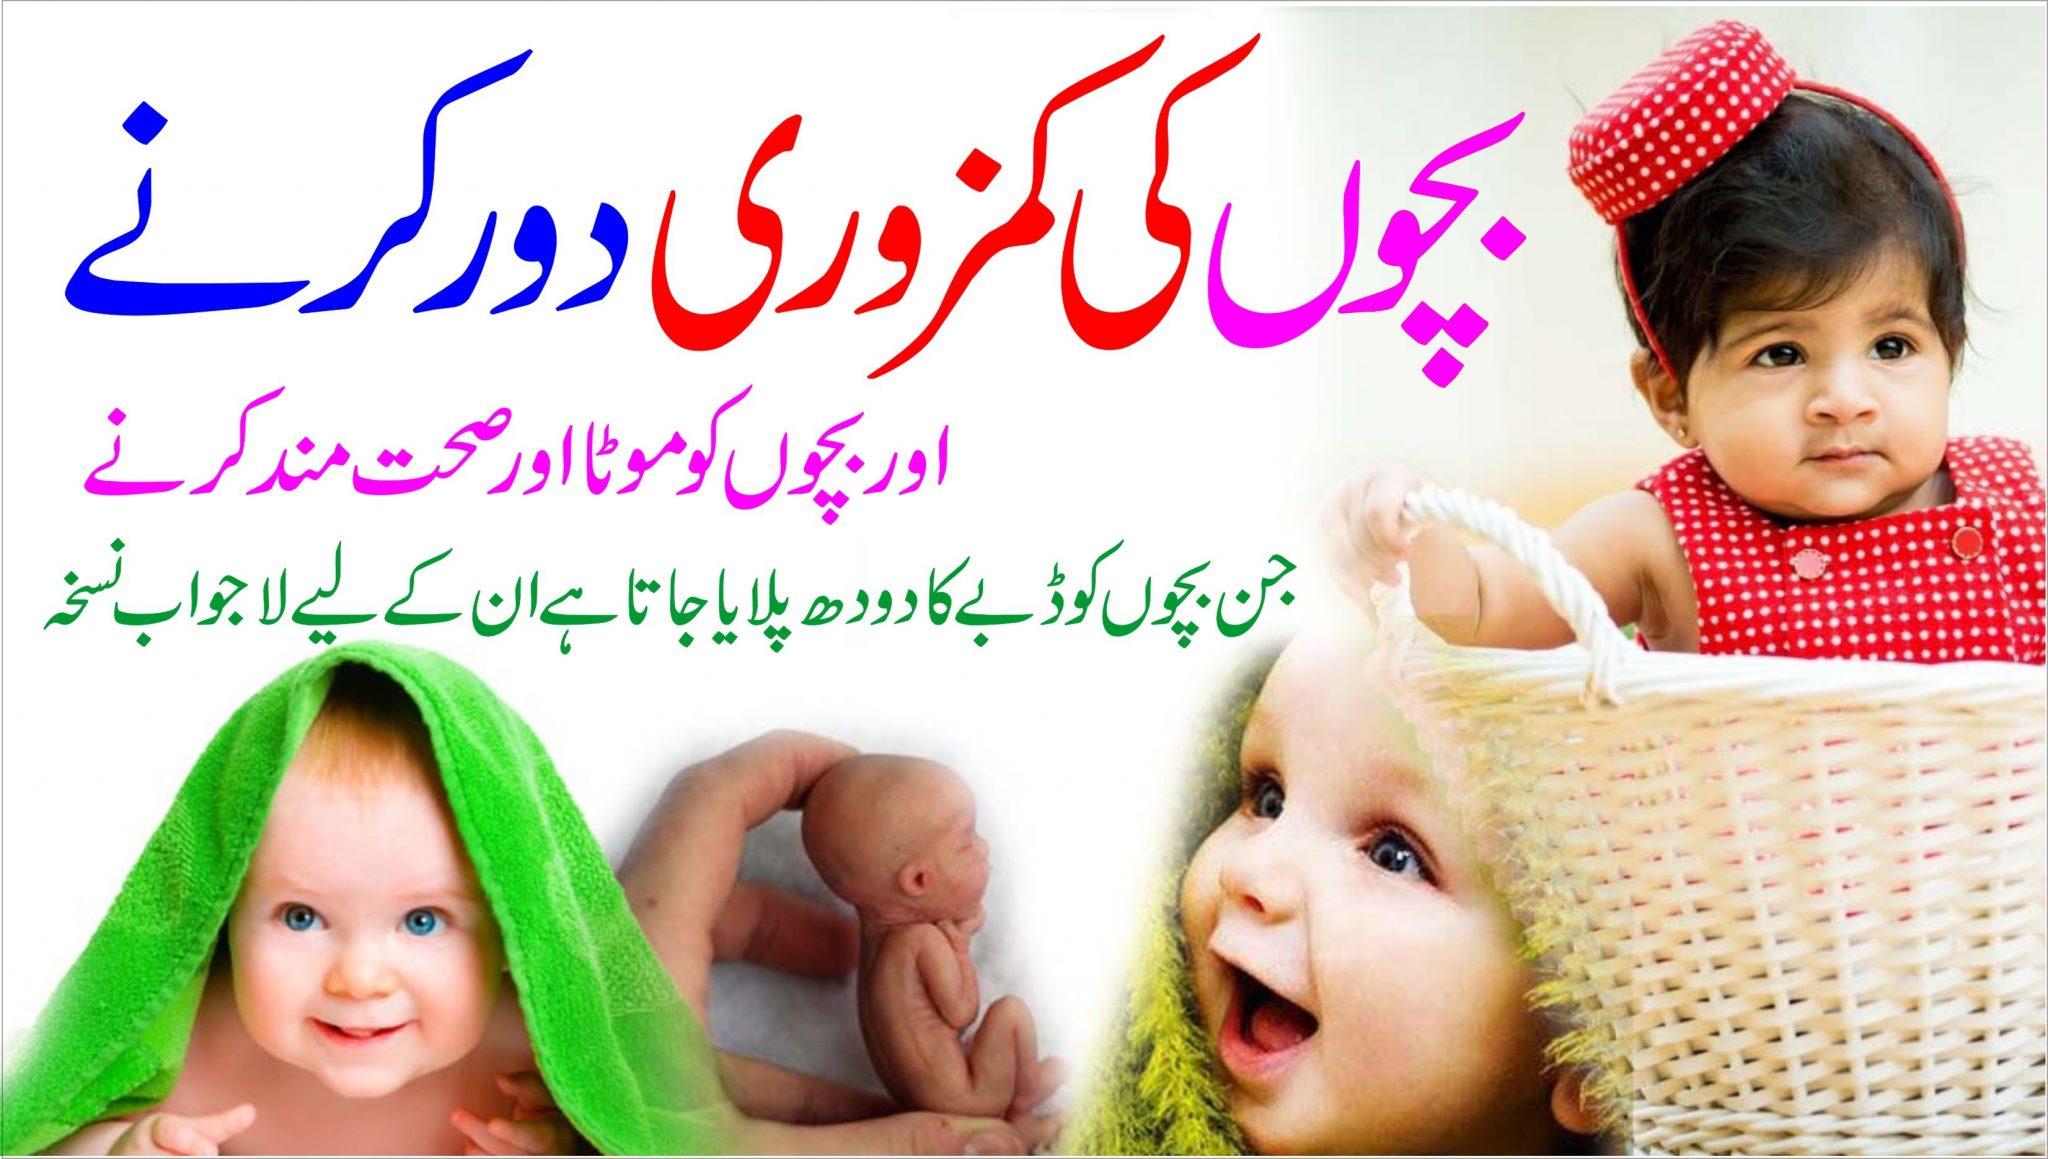 Child Health Care Tips in Urdu Hindi,Child Healthy Food ,Child Health Tips, Bachon ka Elaj